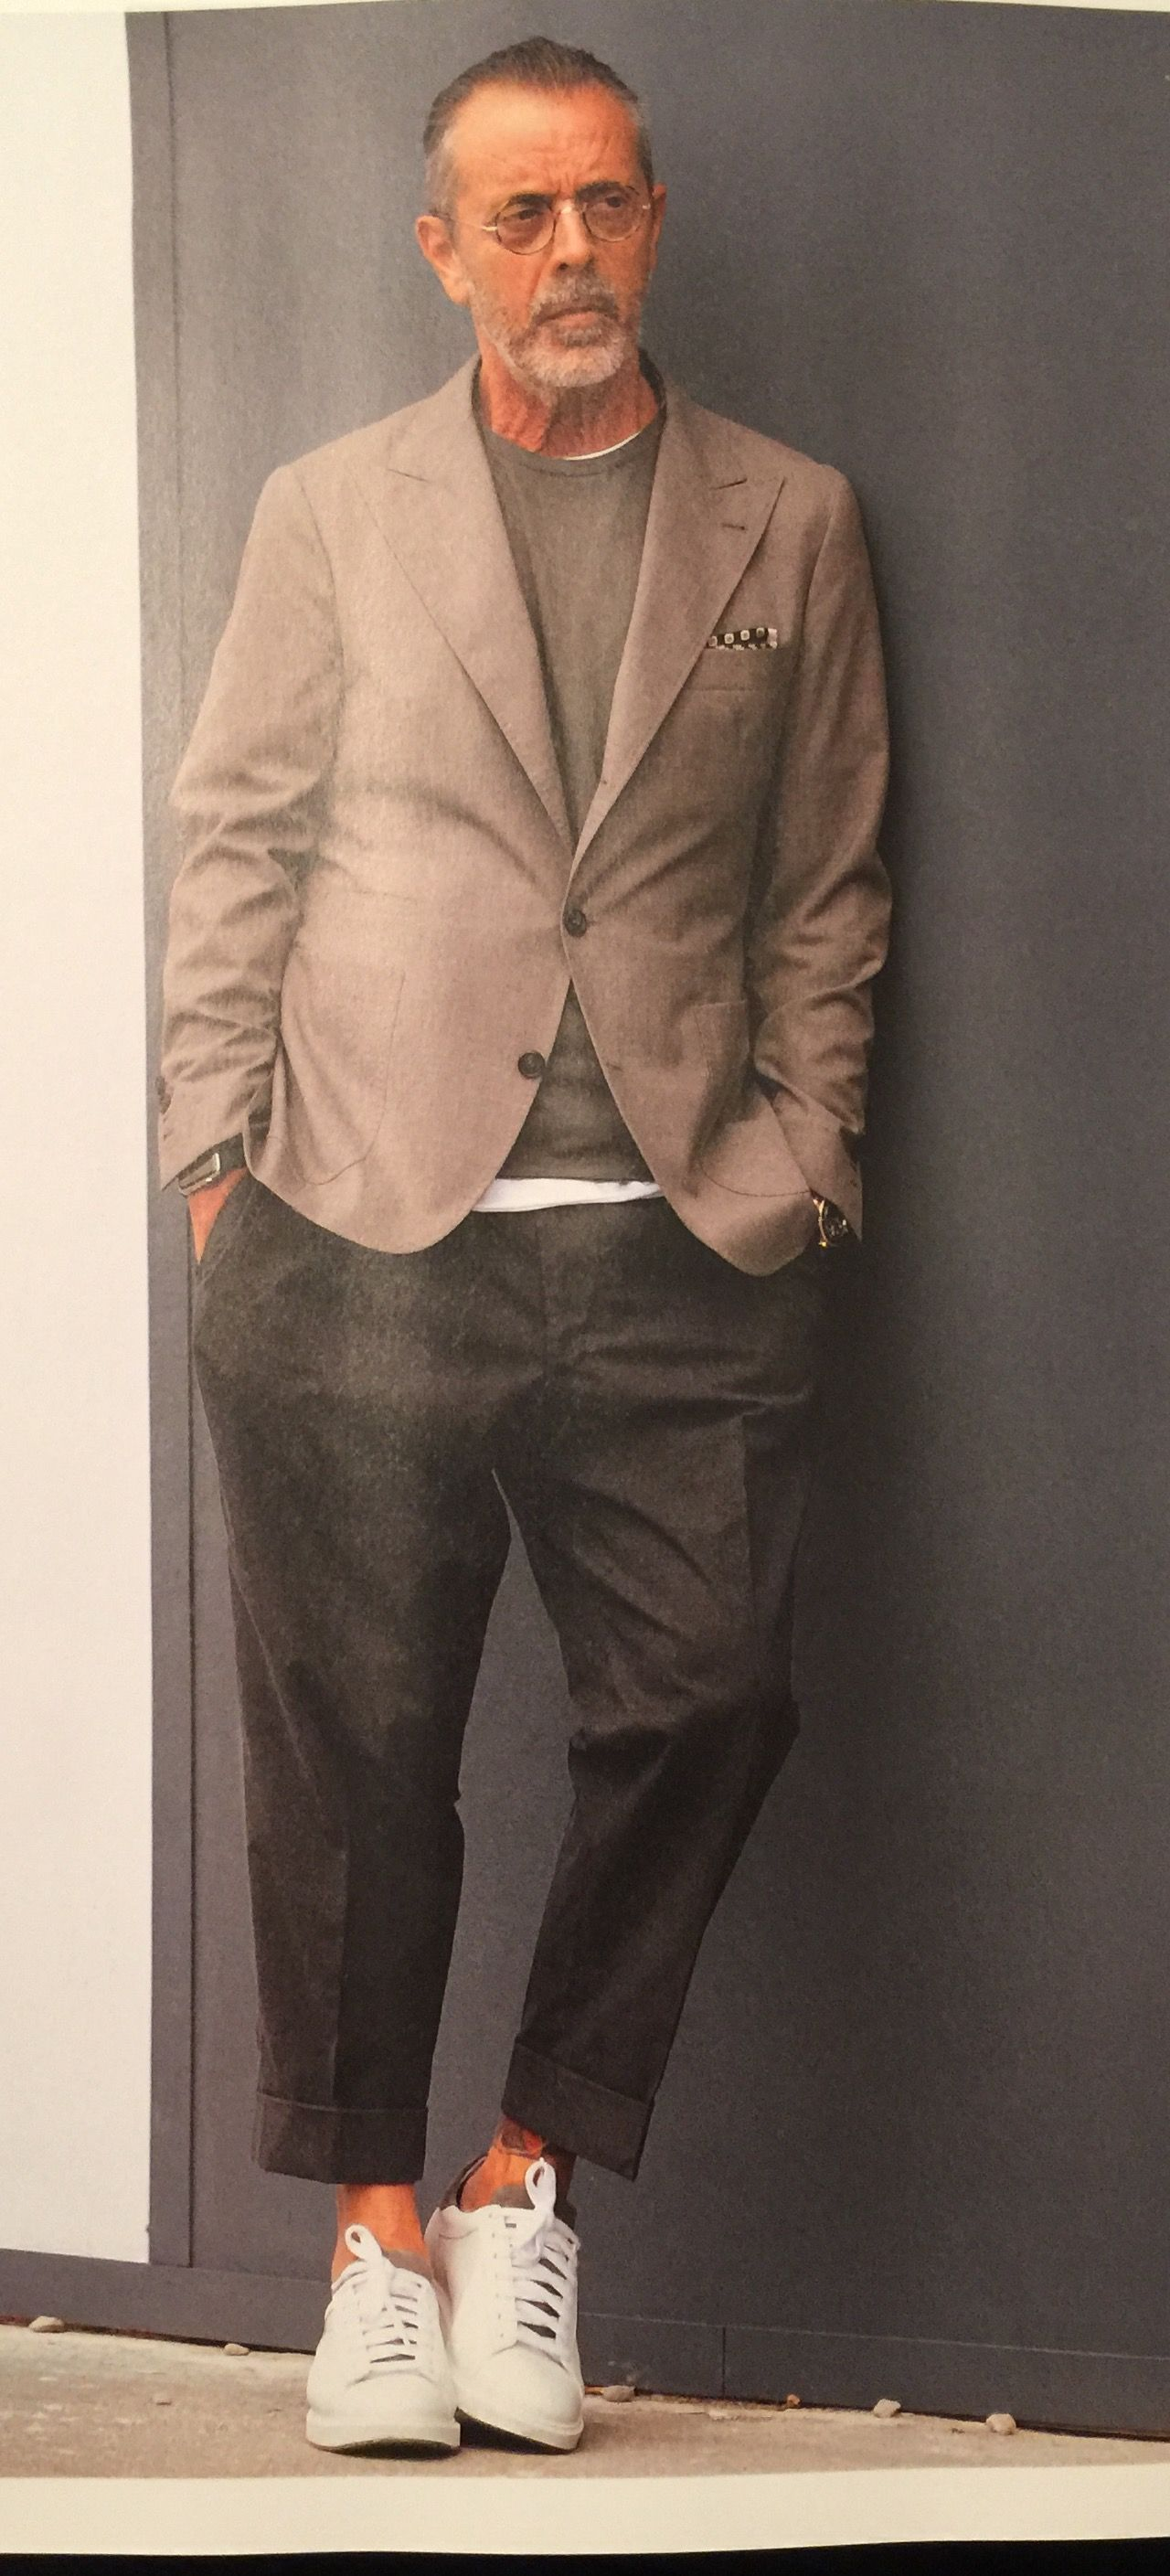 tonal men 39 s clothing in 2018 pinterest m nner mode mode und mode f r m nner. Black Bedroom Furniture Sets. Home Design Ideas